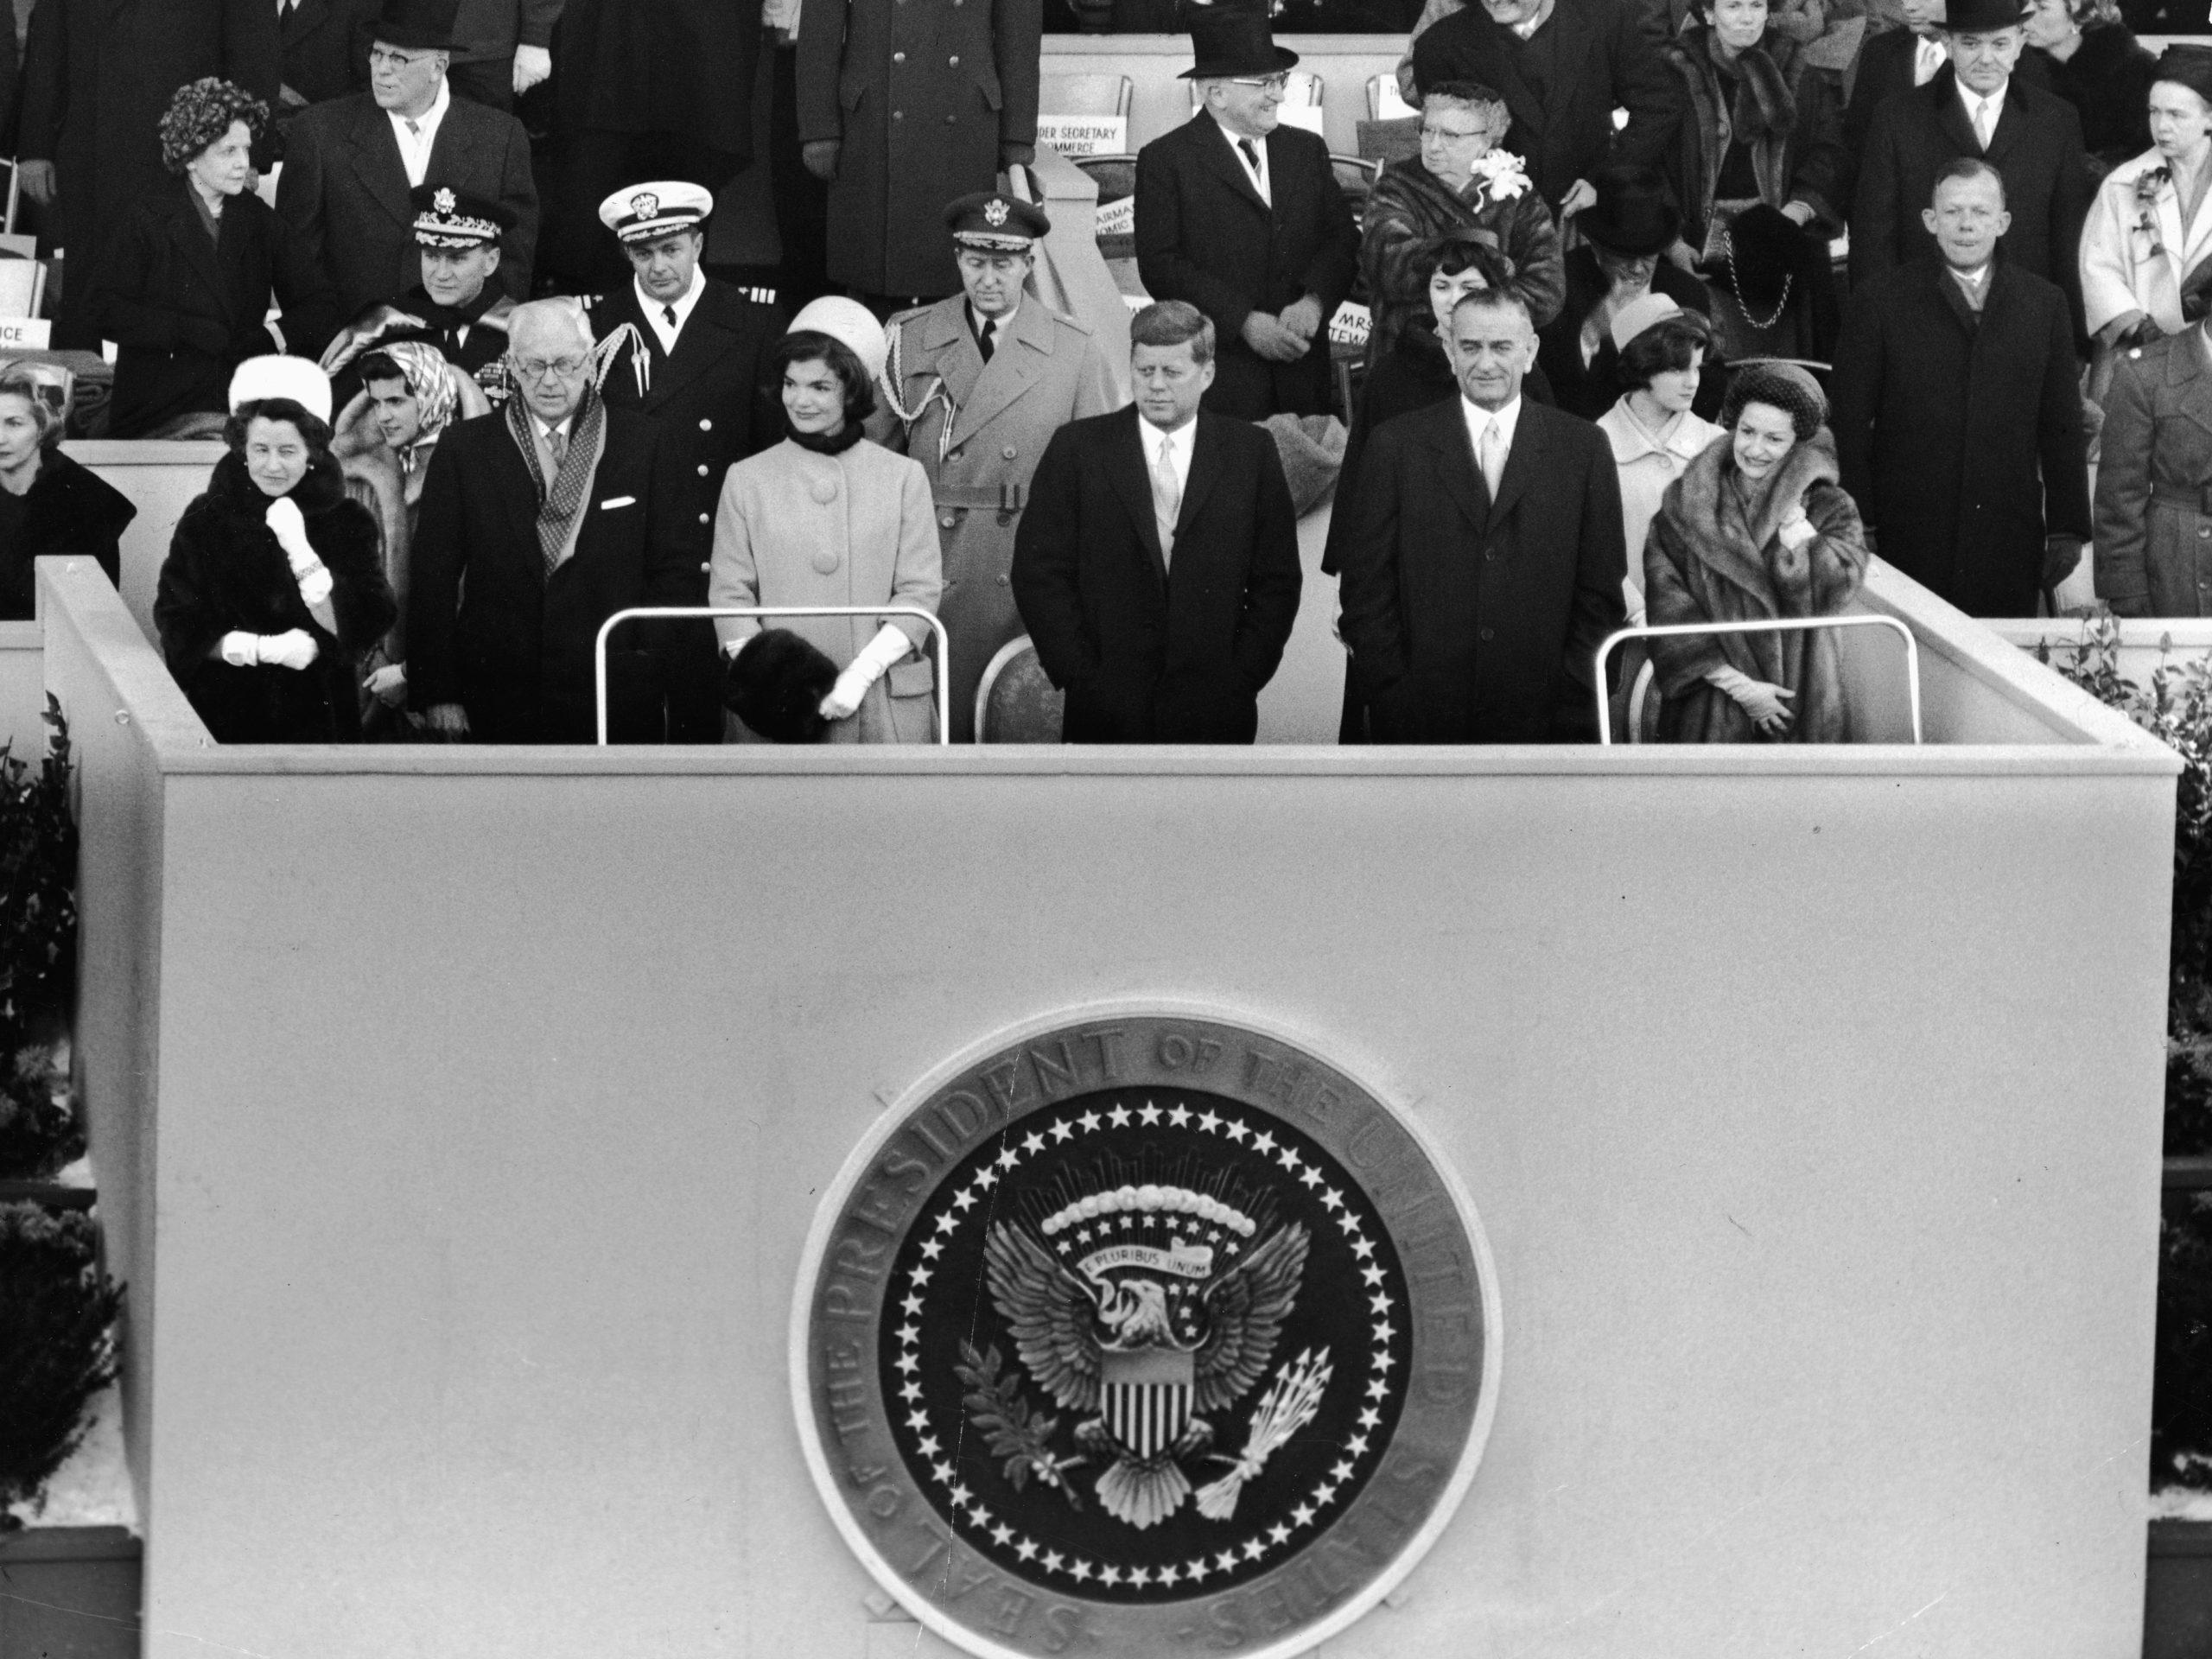 The Inauguration Of President John F. Kennedy